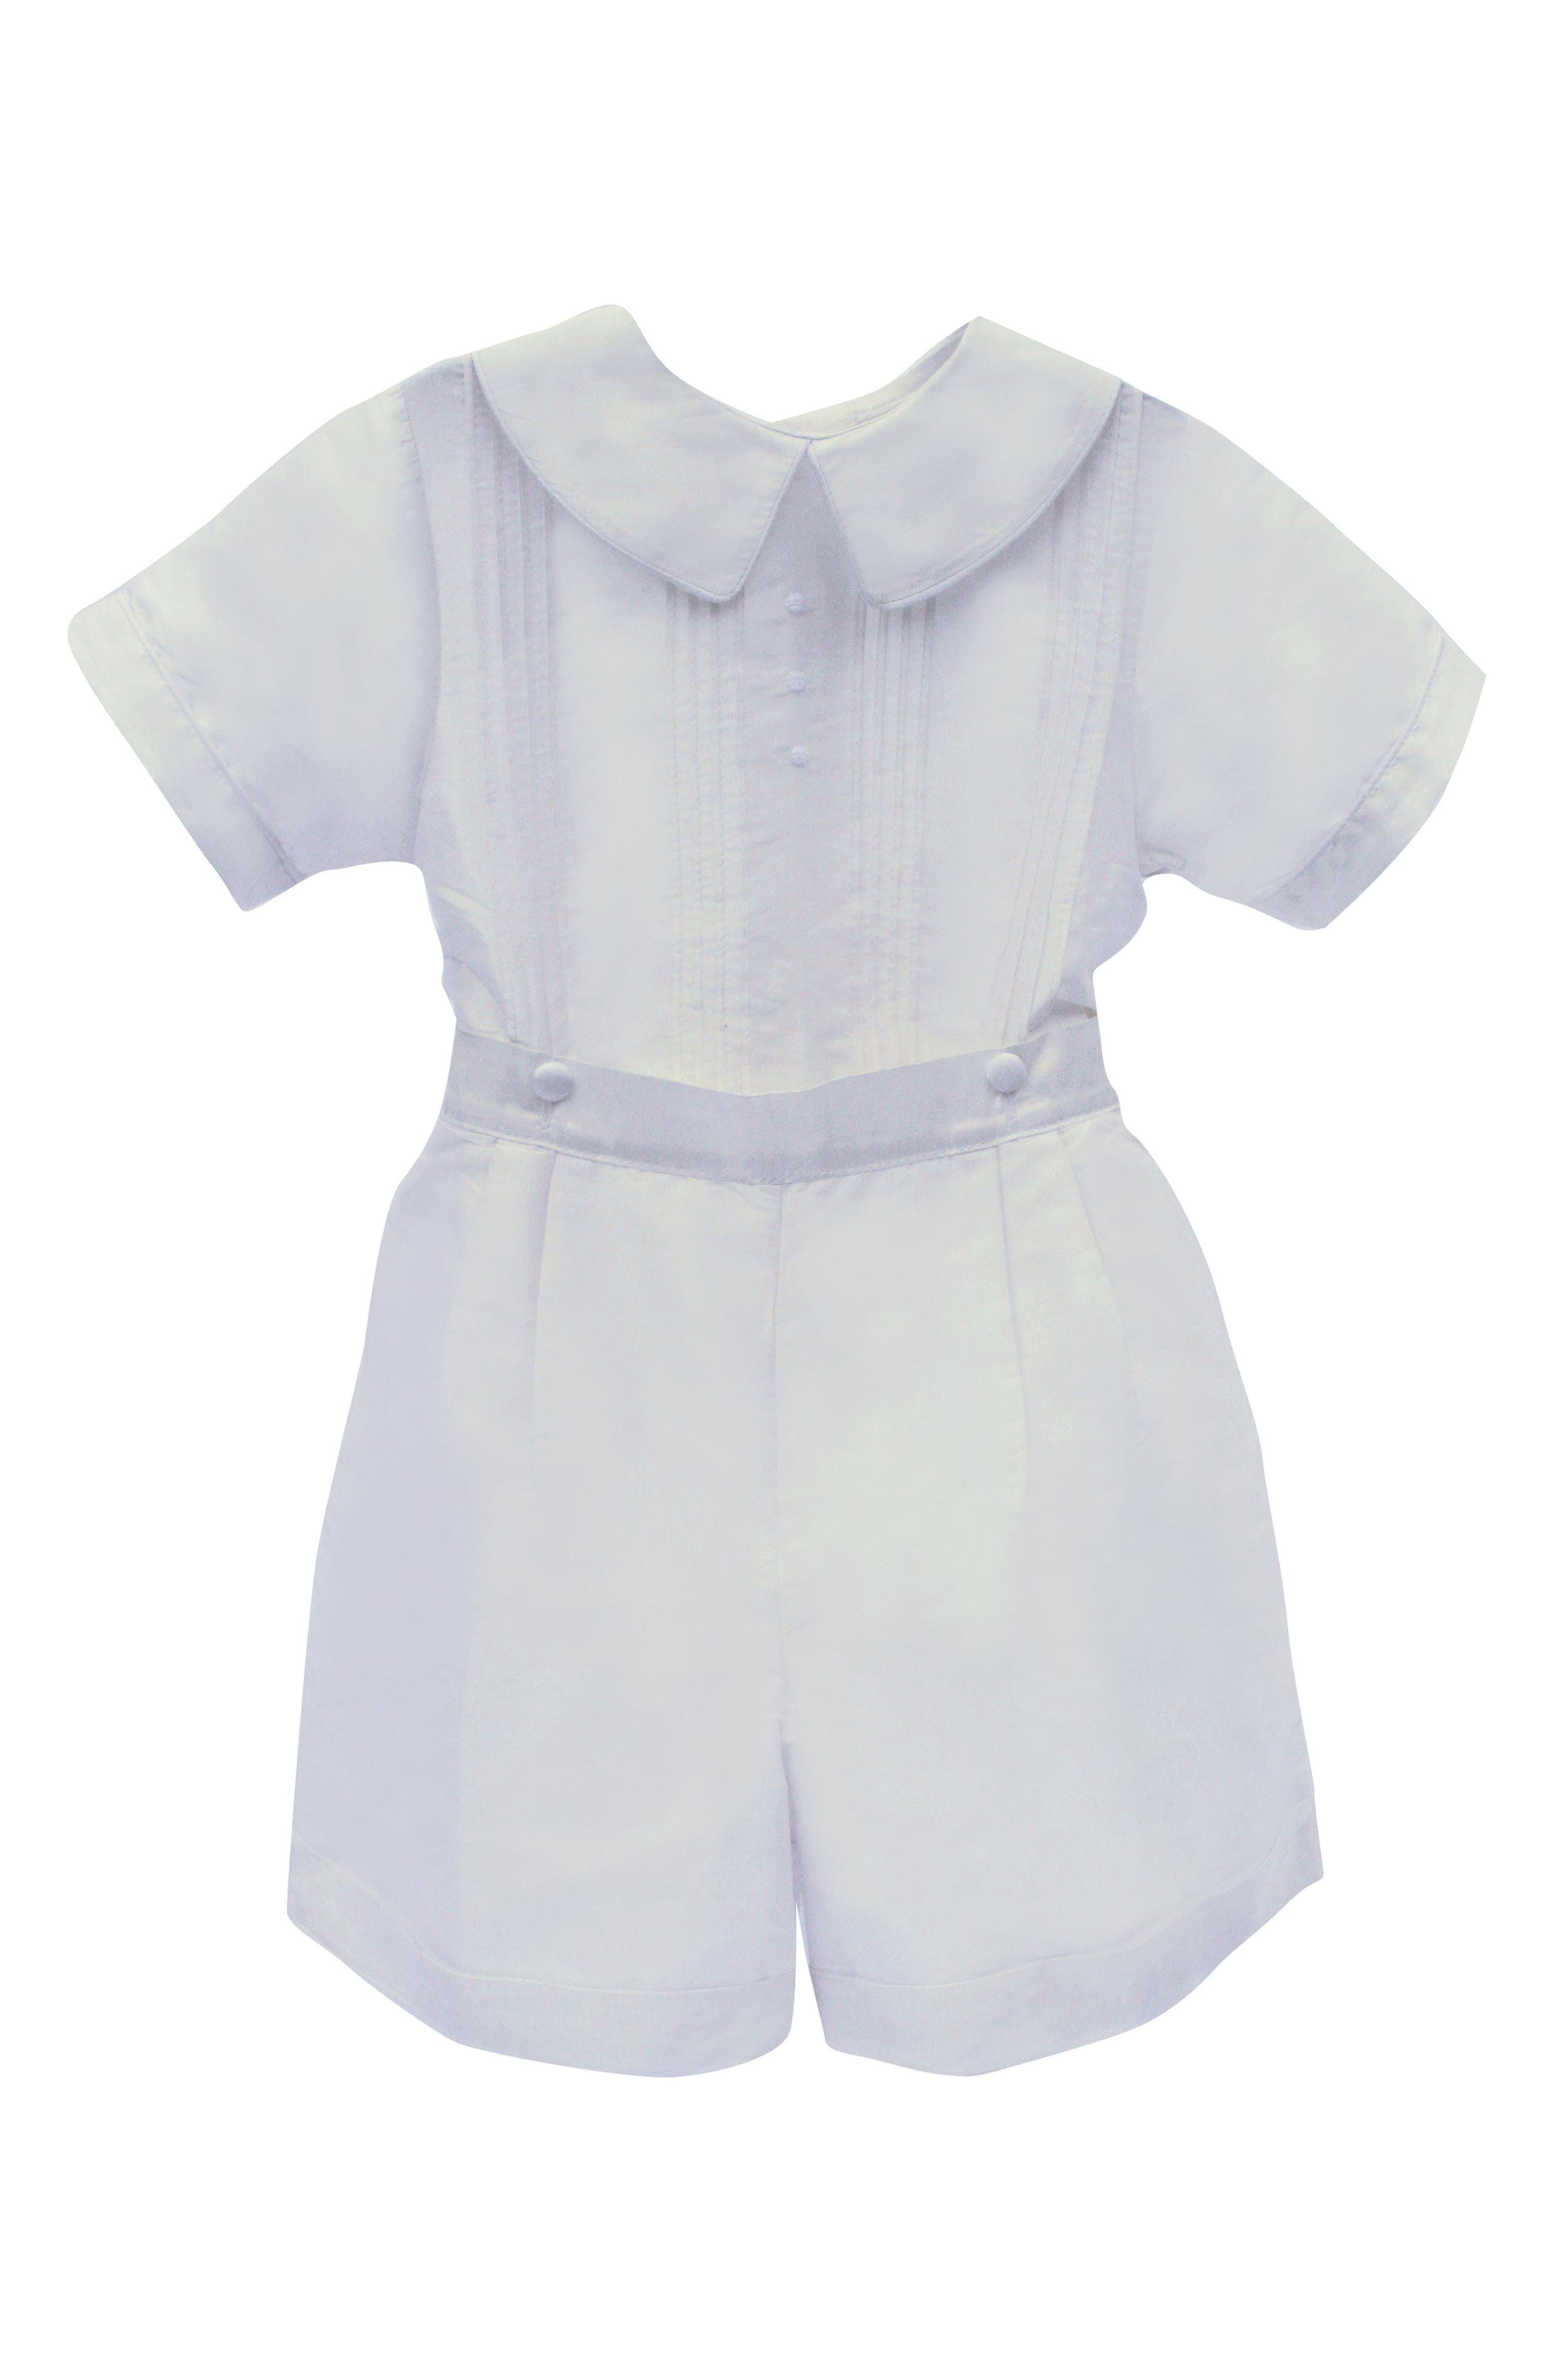 Sebastian Shirt & Pants Set,                             Main thumbnail 1, color,                             White